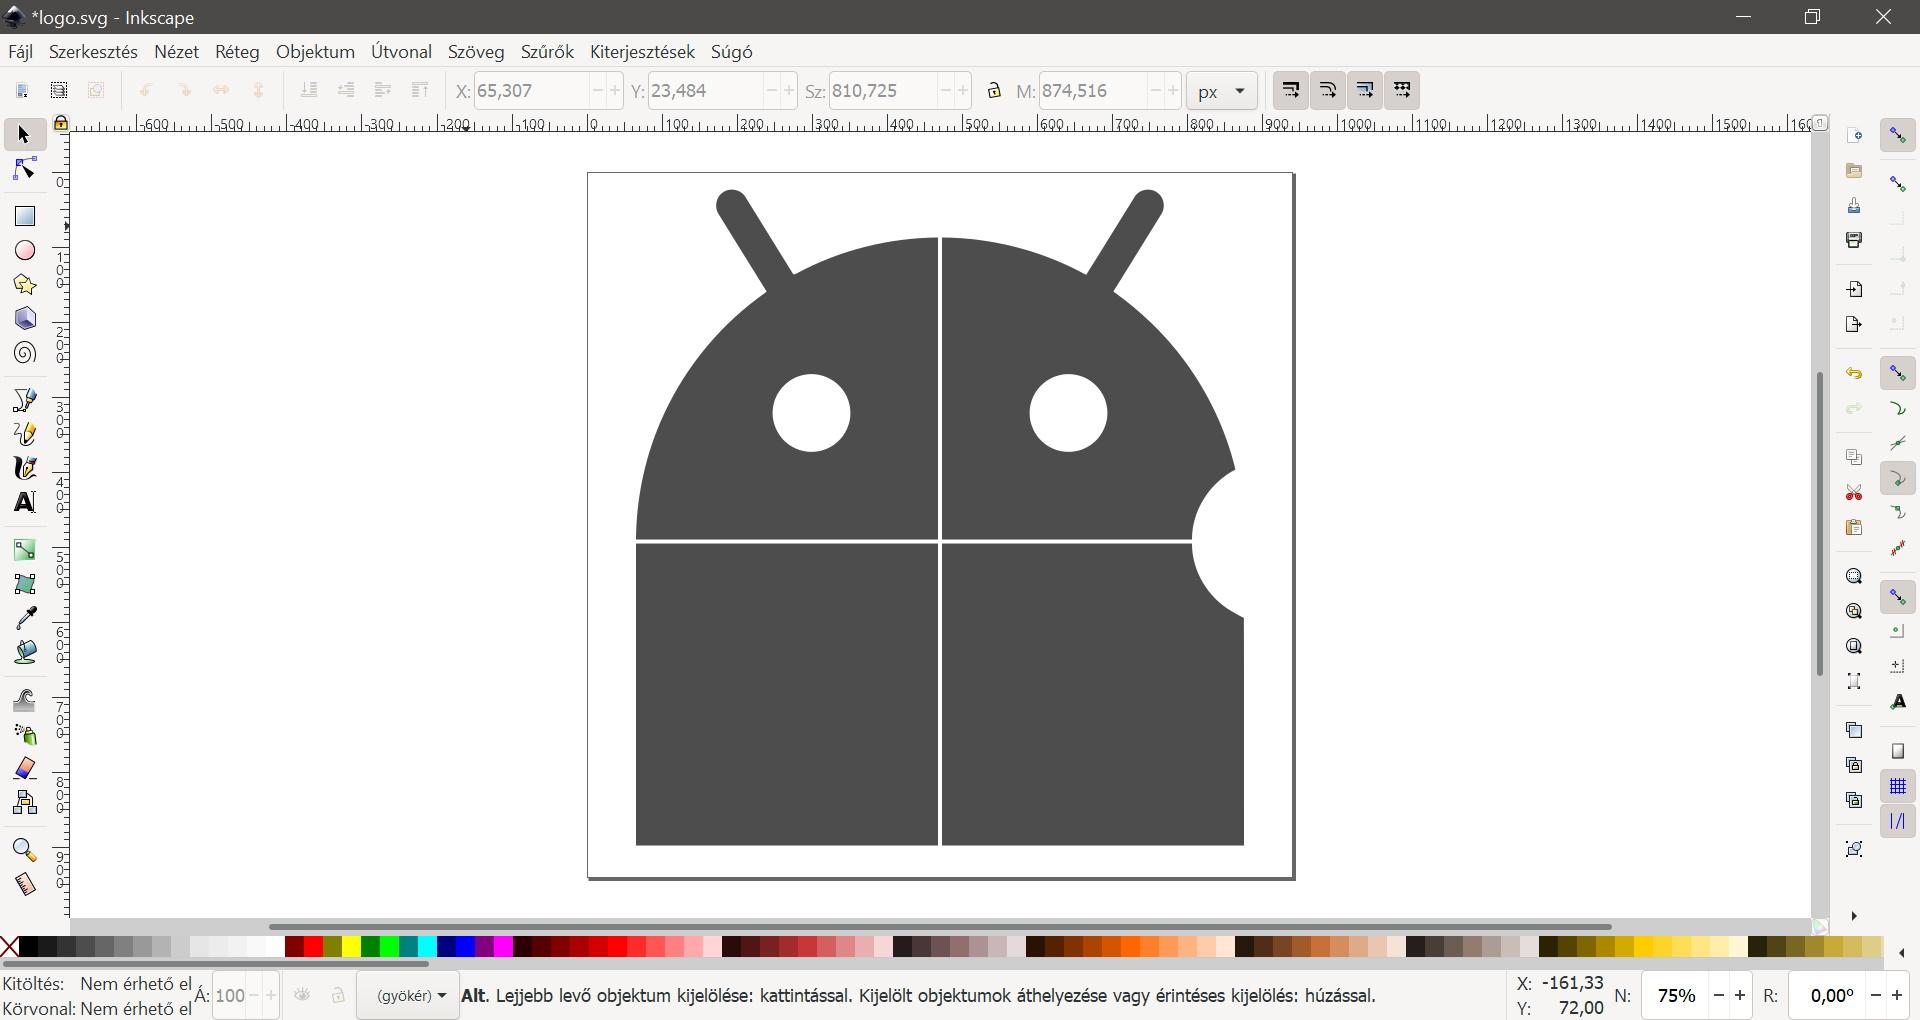 oprend.hu/infusions/downloads/images/screenshots/inkscape.jpg